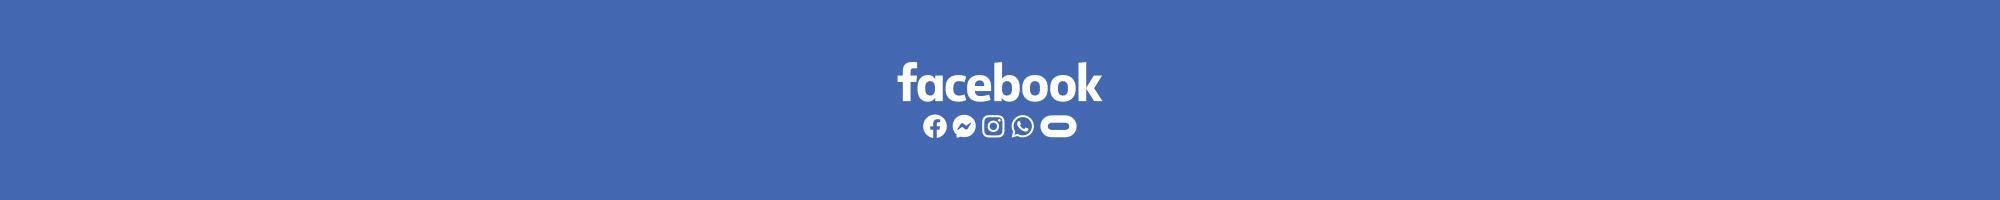 Facebook Community Boost Sunshine Coast: Caboolture